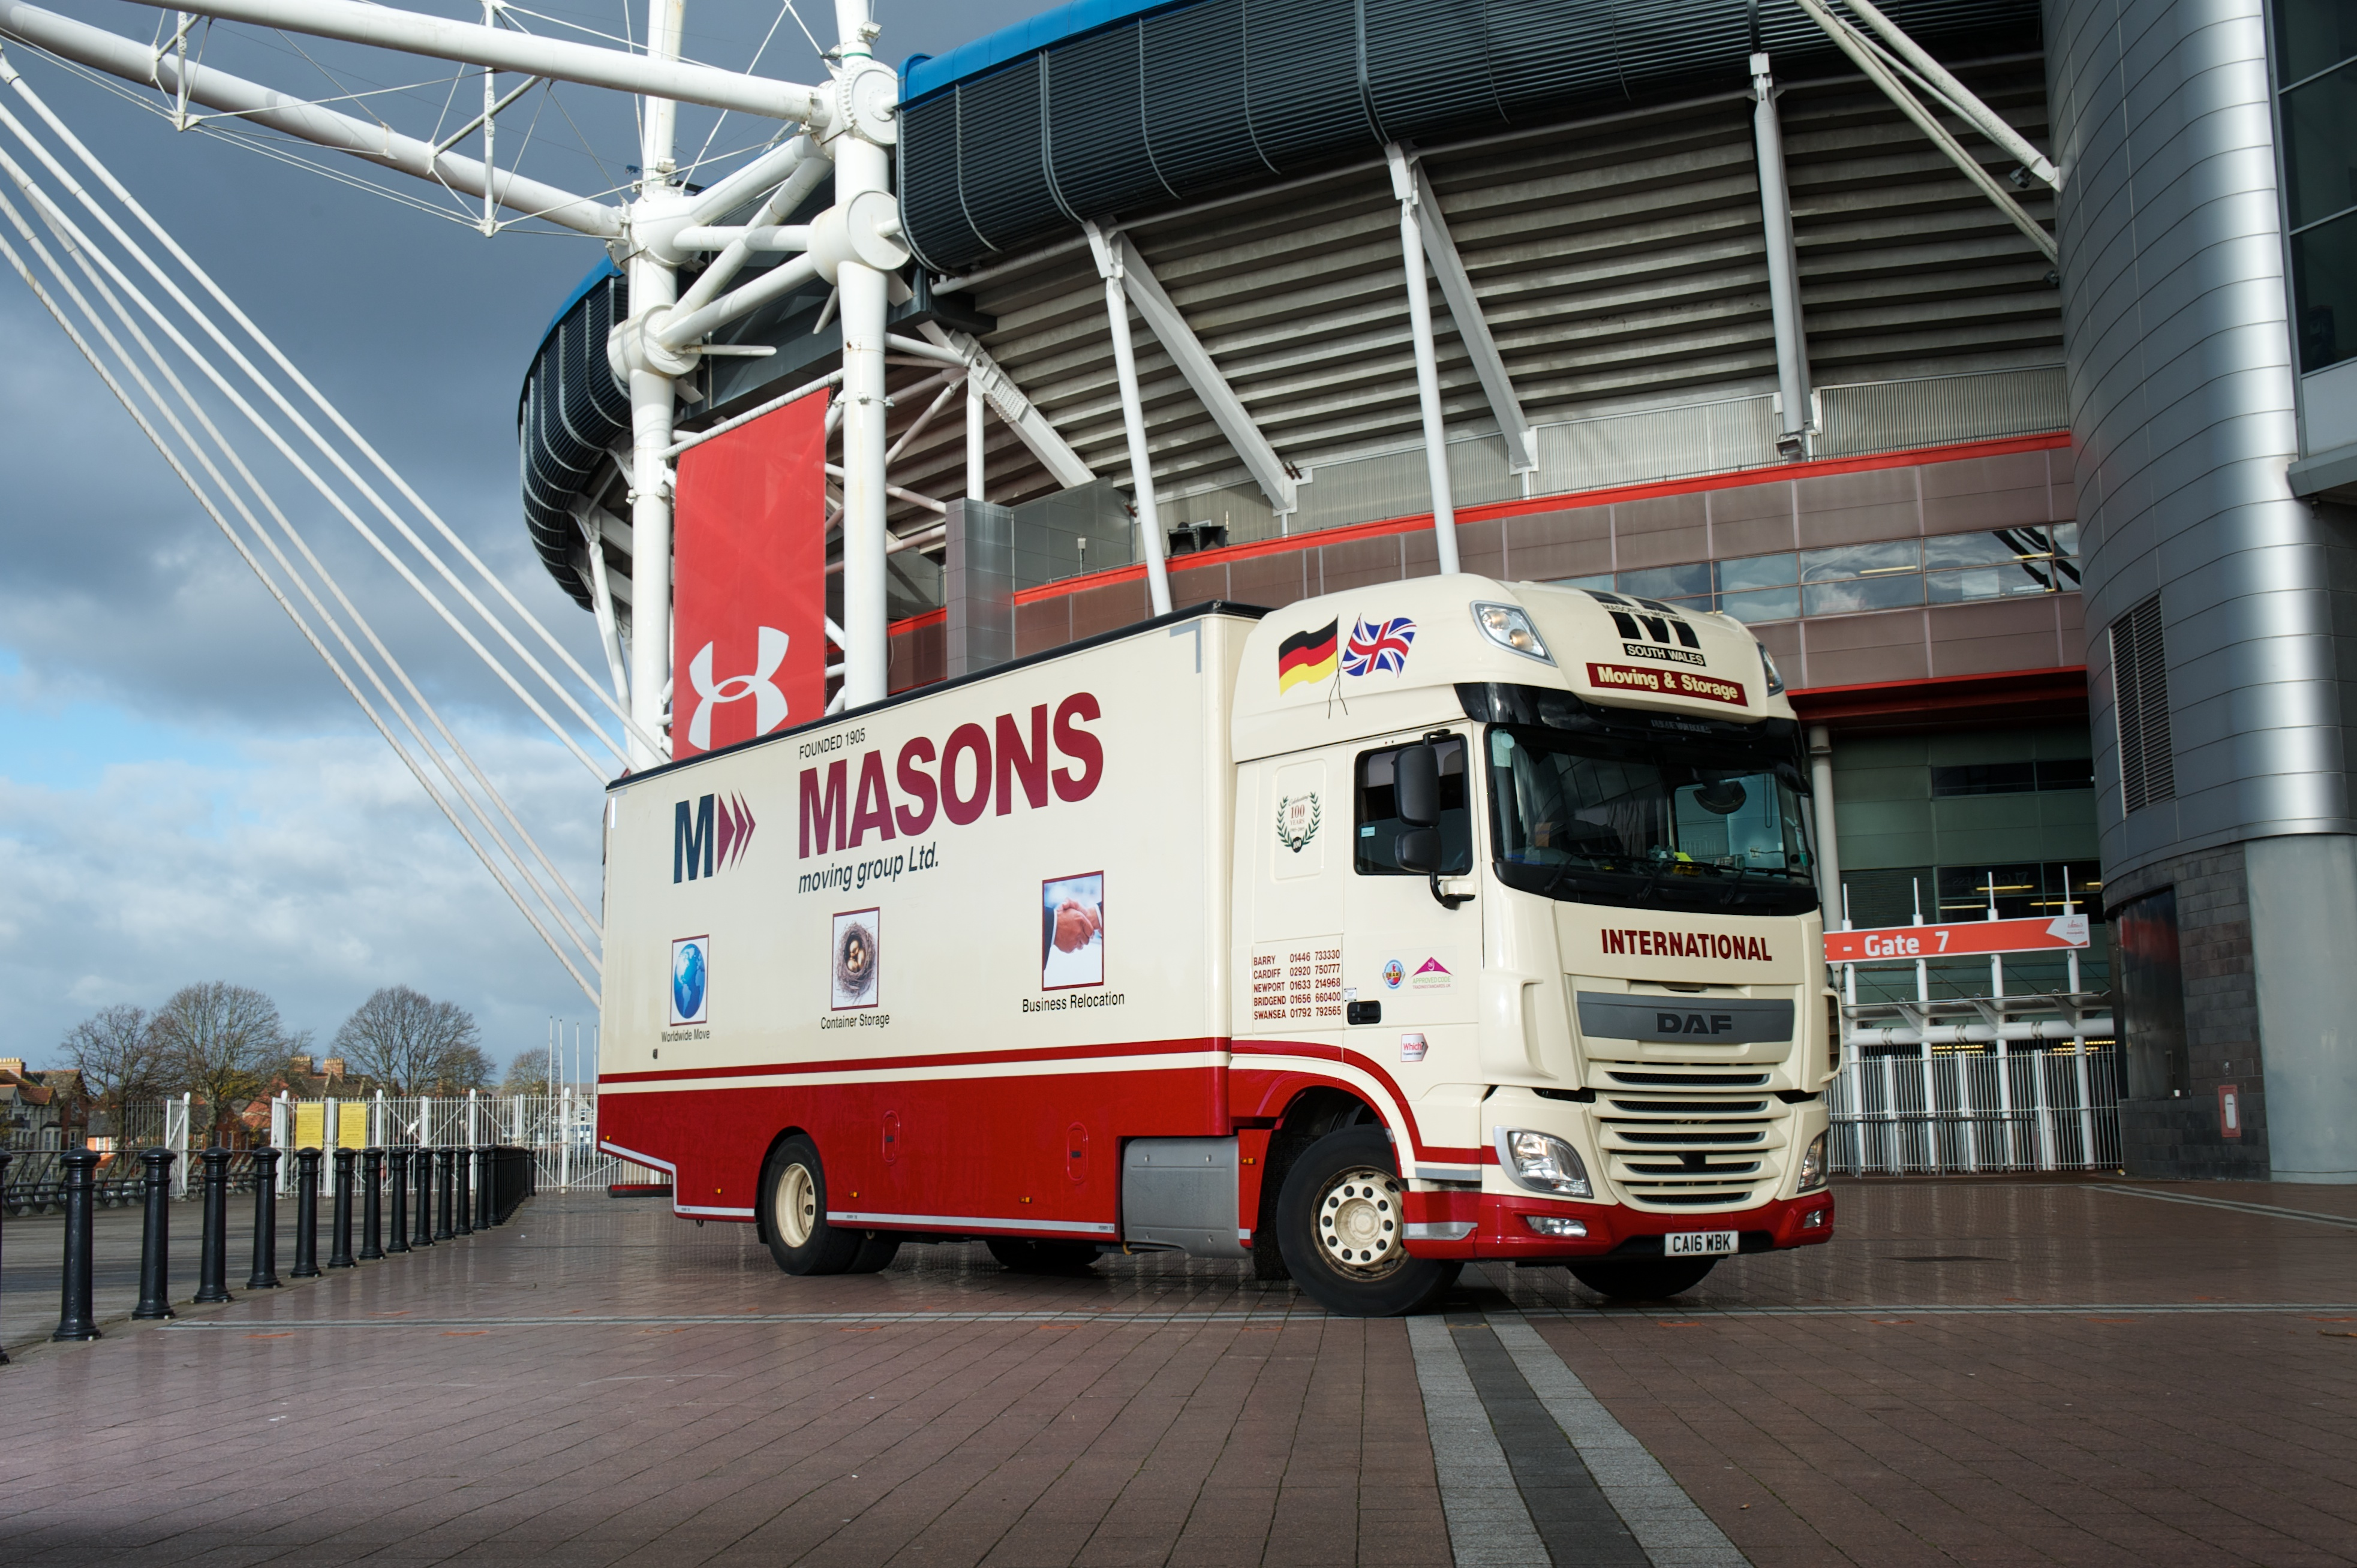 Masons Removals van at Cardiff Principality Stadium